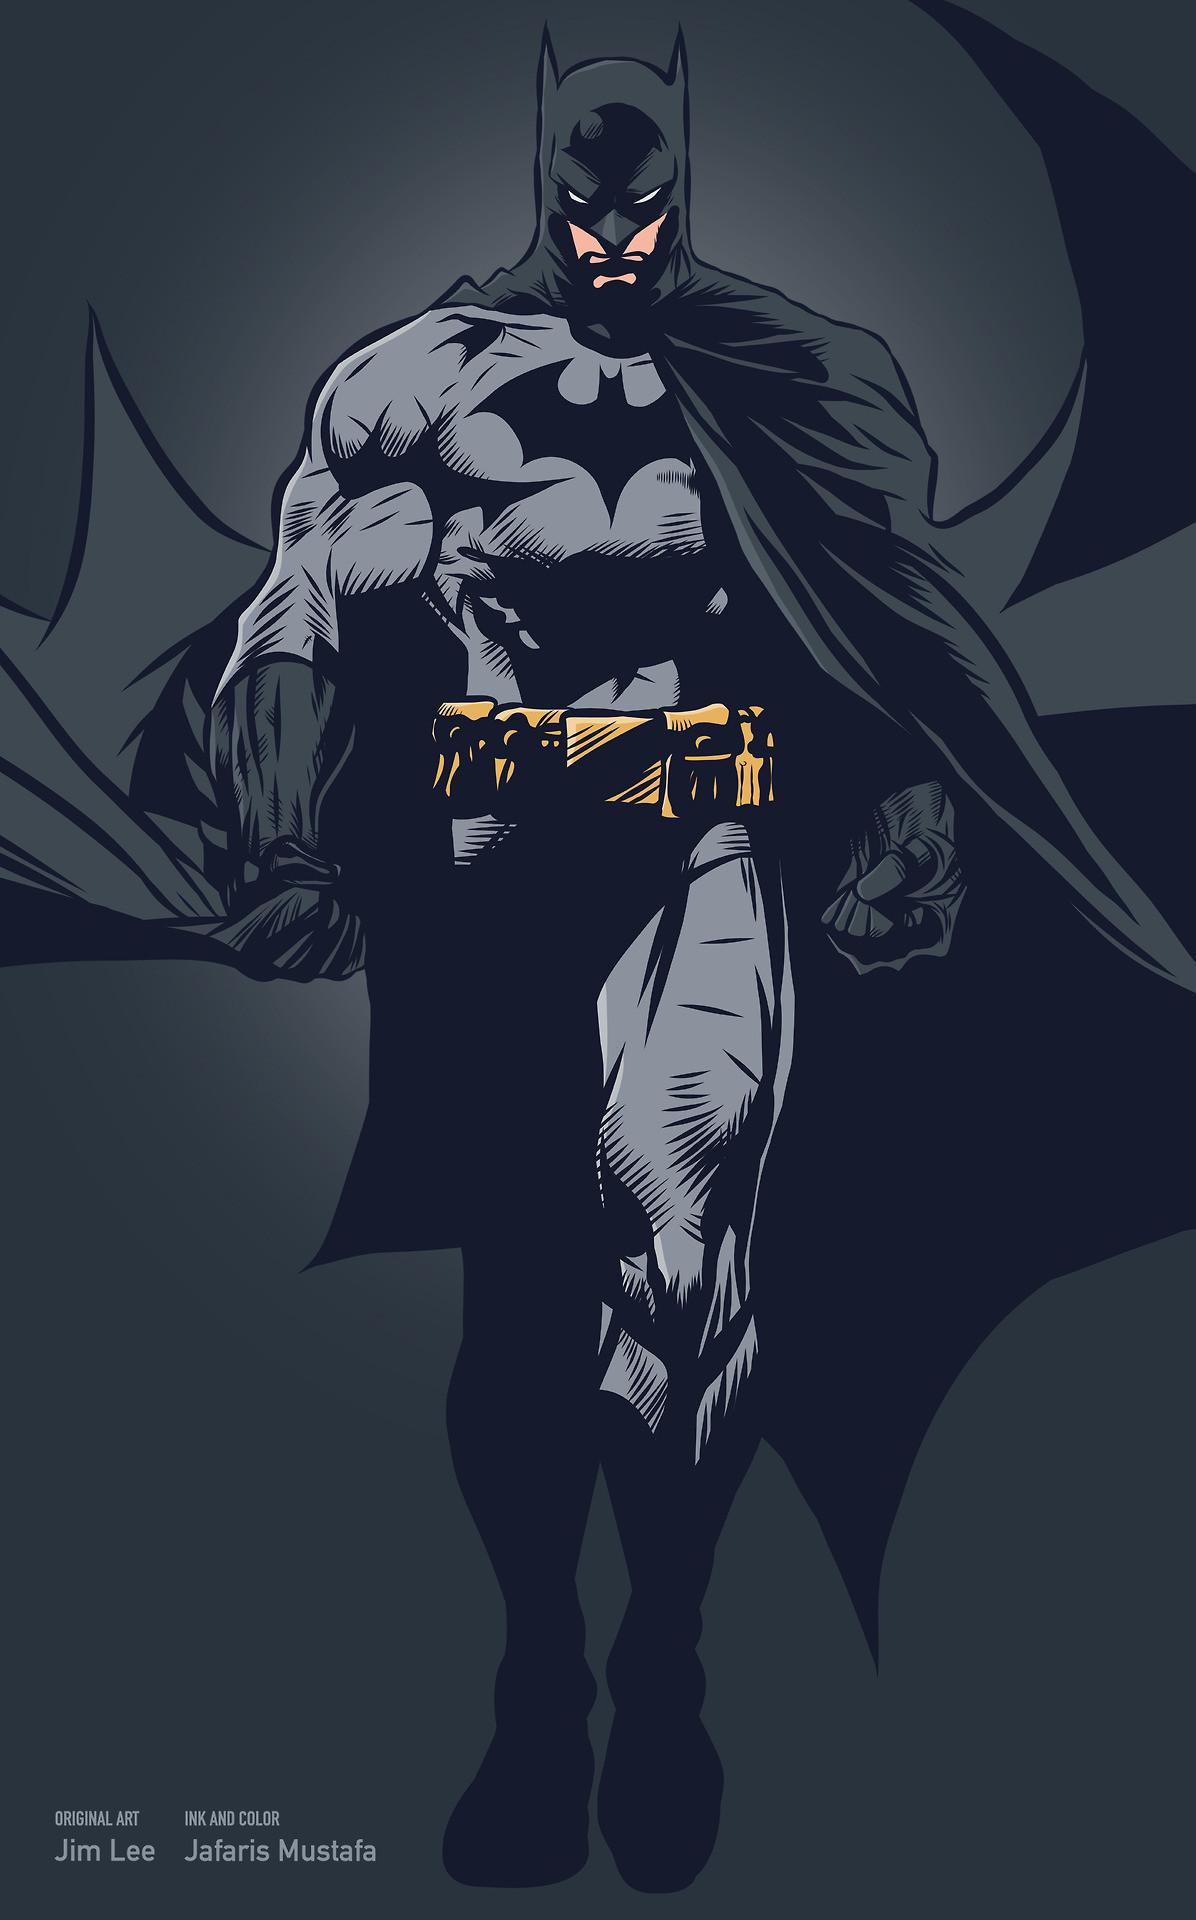 Batman by Jim Lee, inks and colours by Jarafris Mustafa